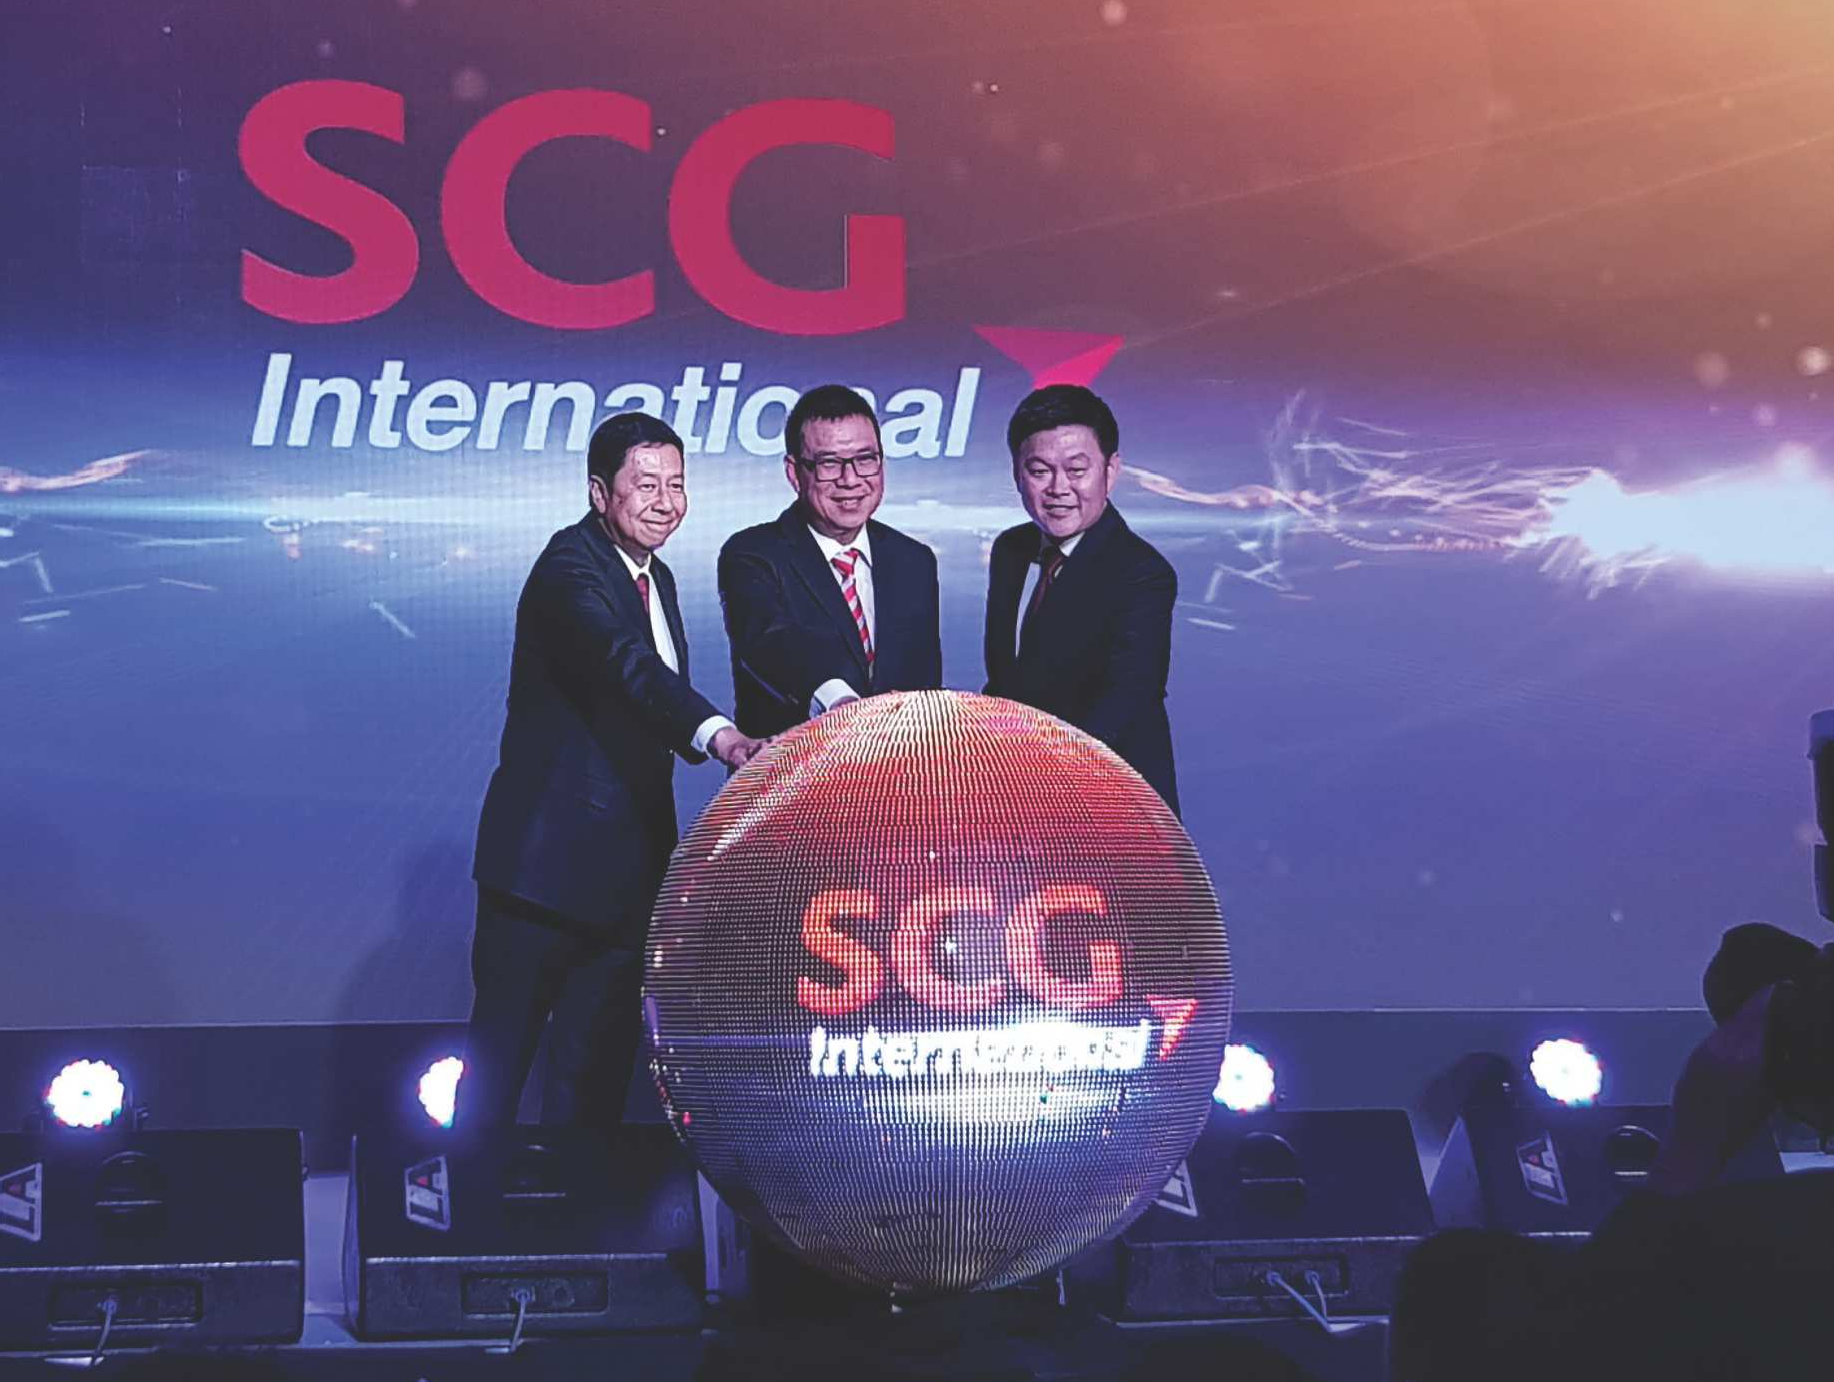 Top Executives celebrate the rebranding scg trading to SCG International Corporation